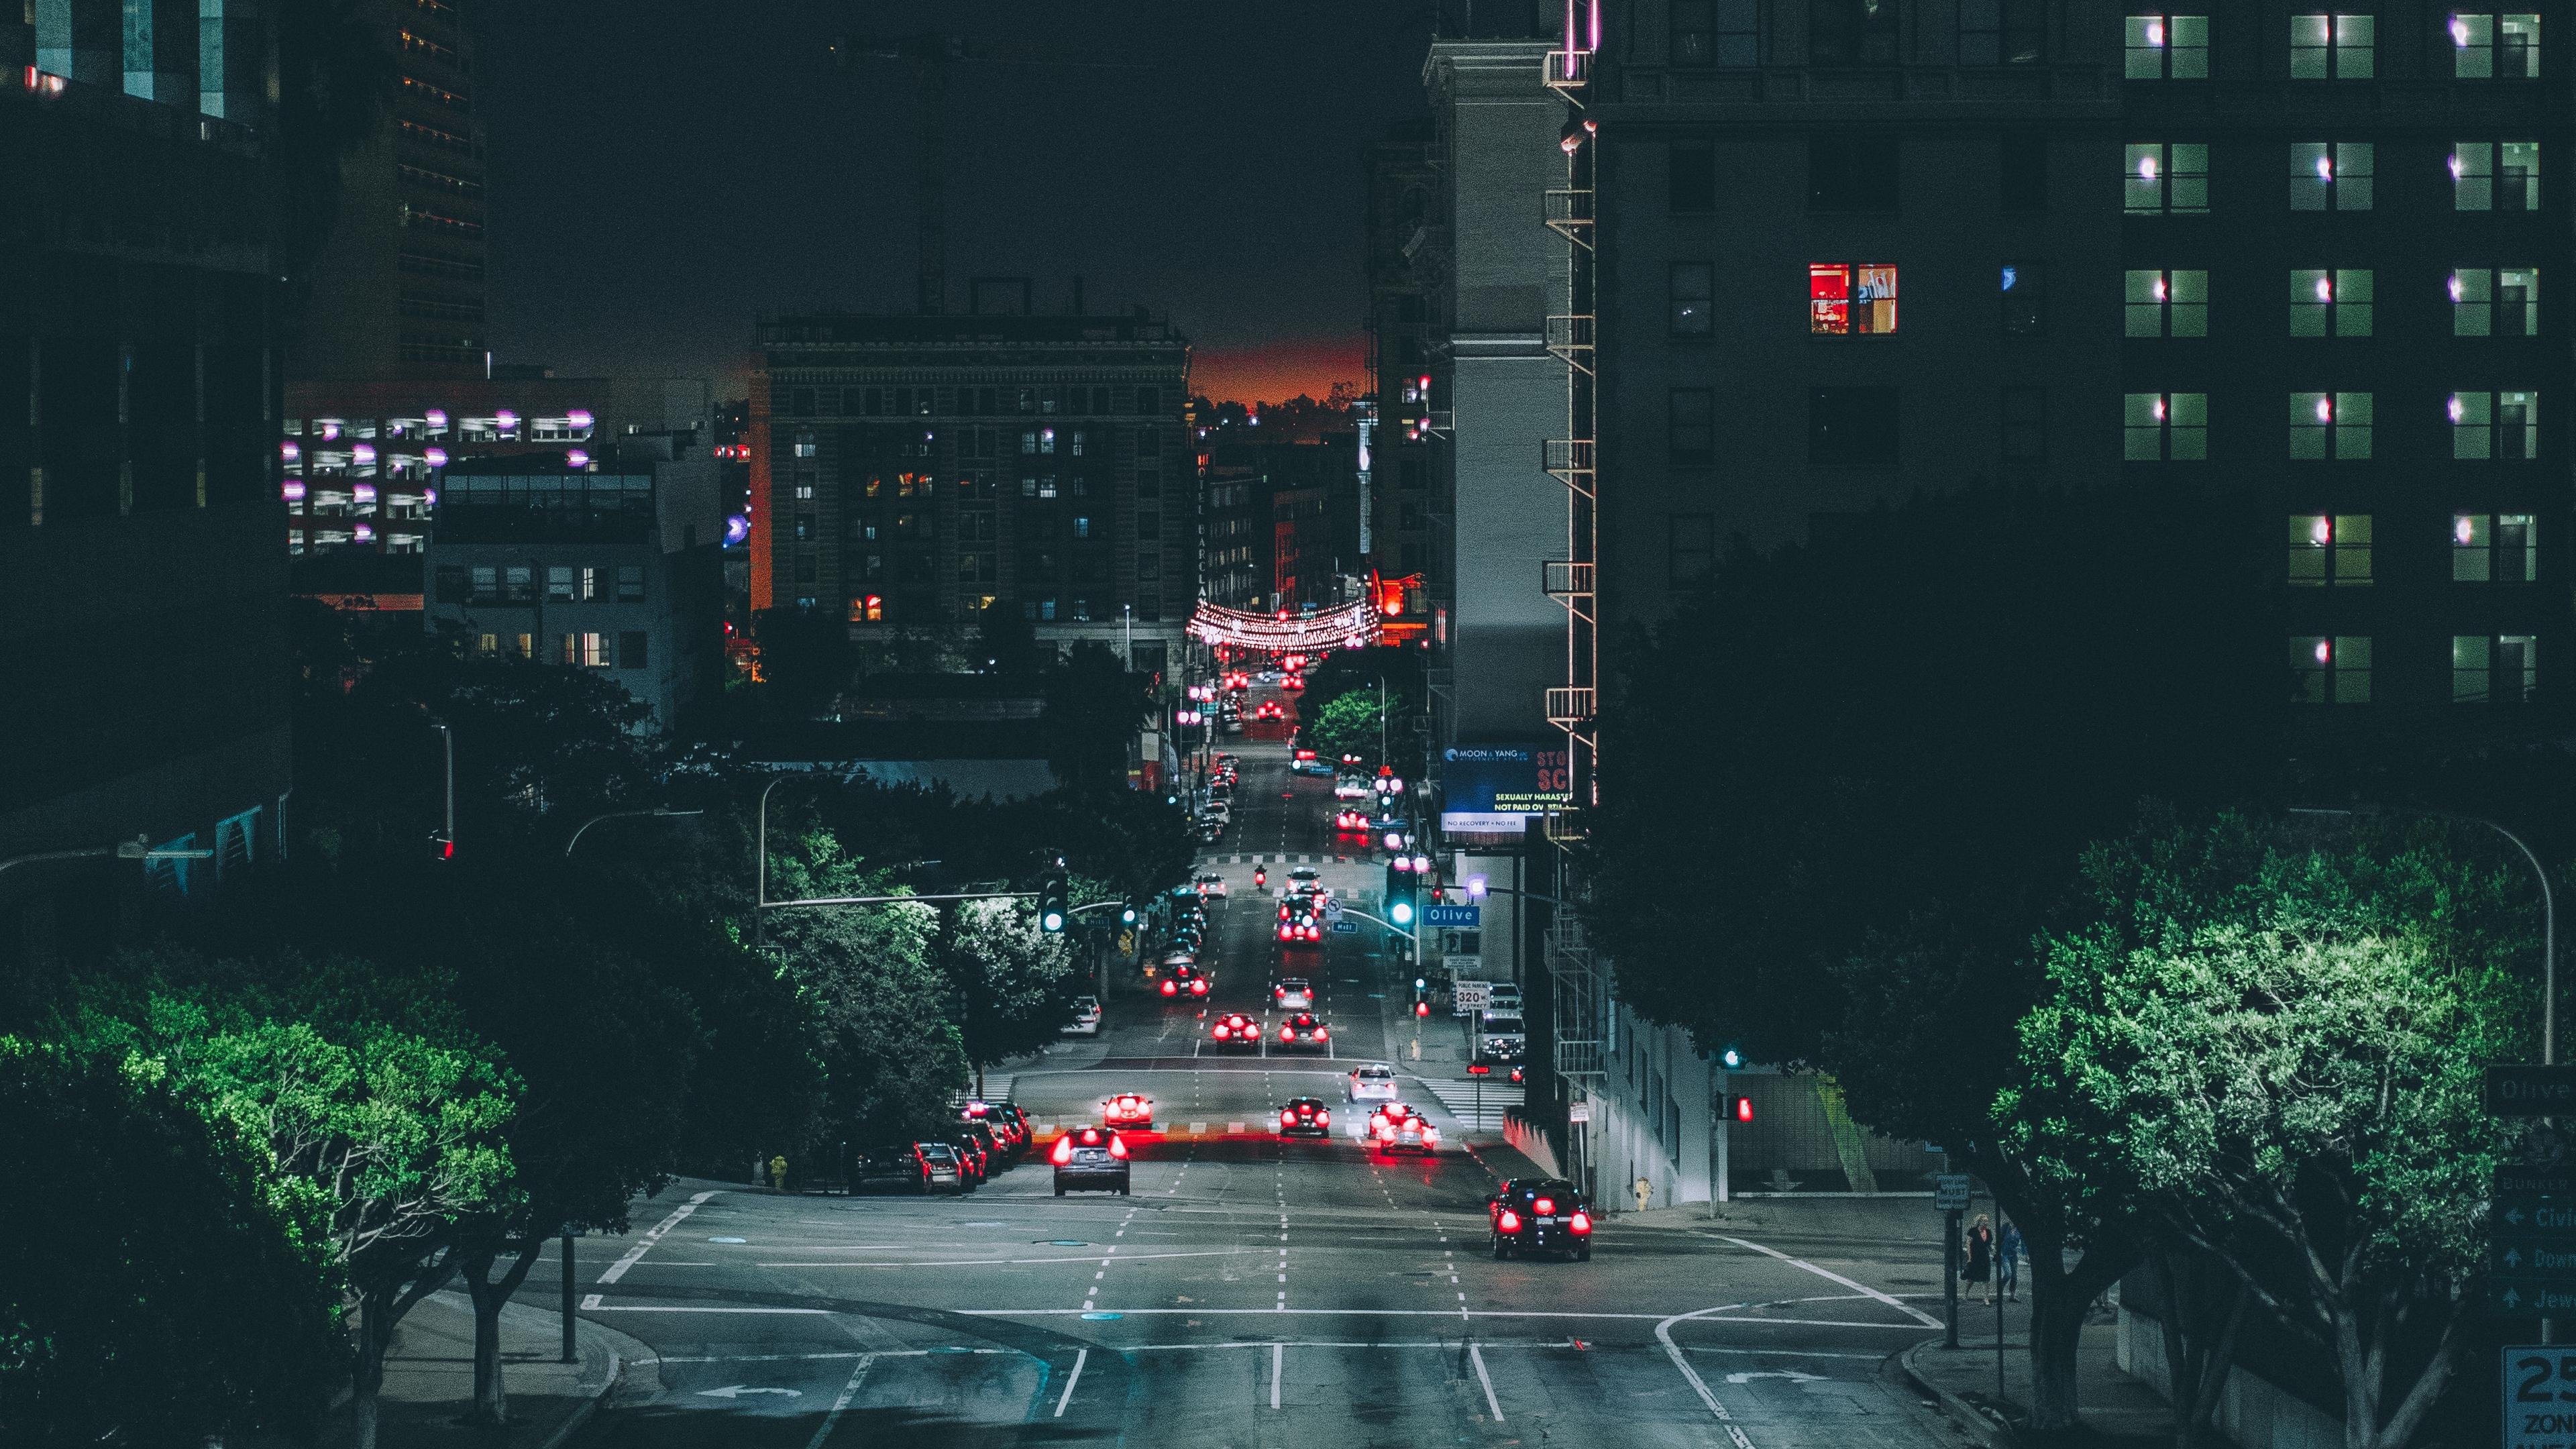 los angeles night city road traffic 4k 1538068451 - los angeles, night city, road, traffic 4k - Road, night city, los angeles